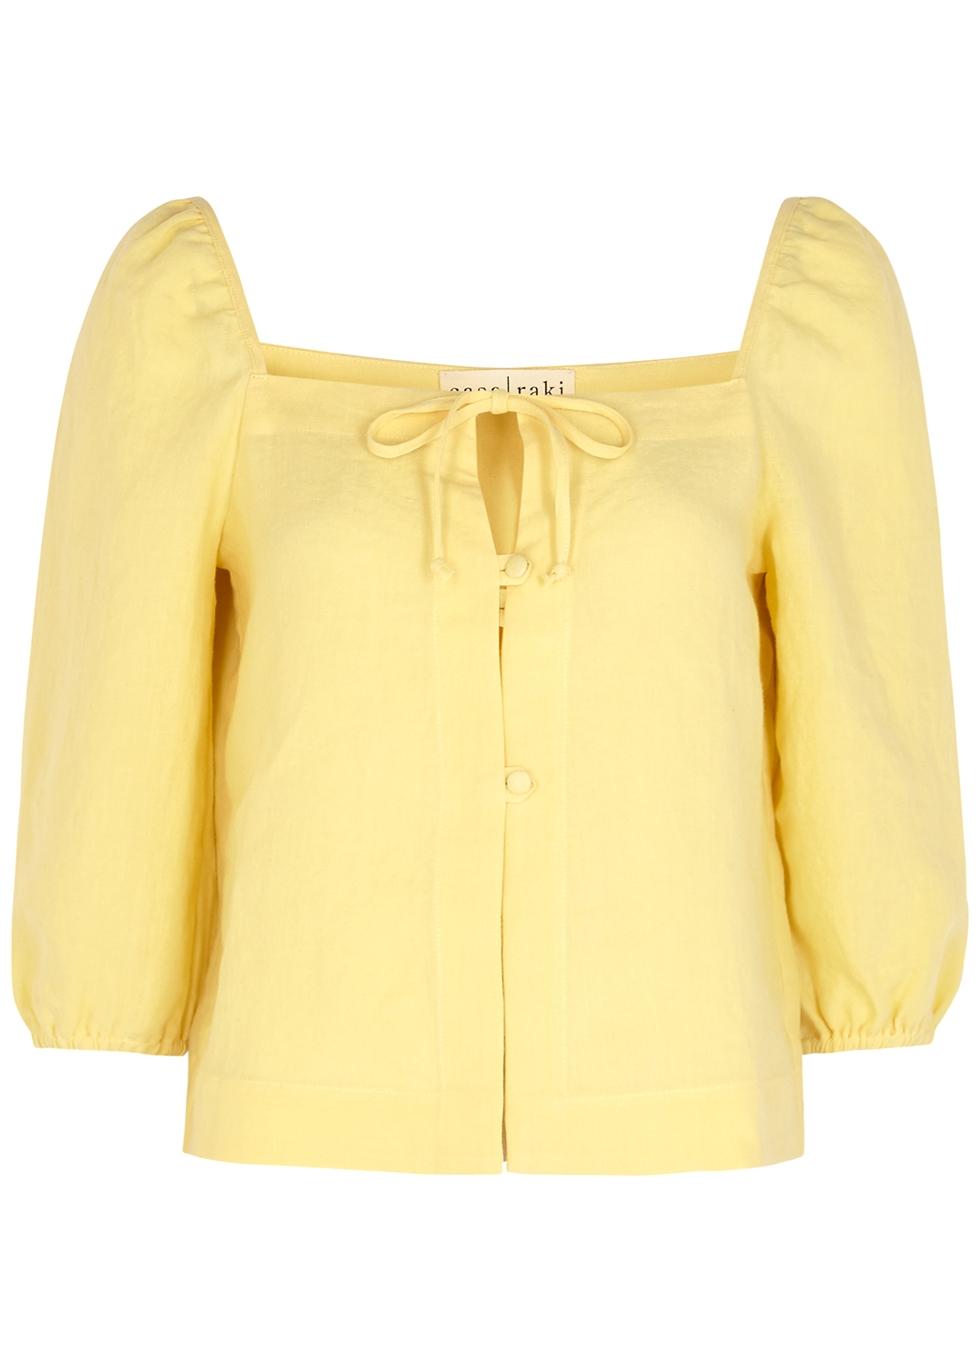 Nicola yellow linen top